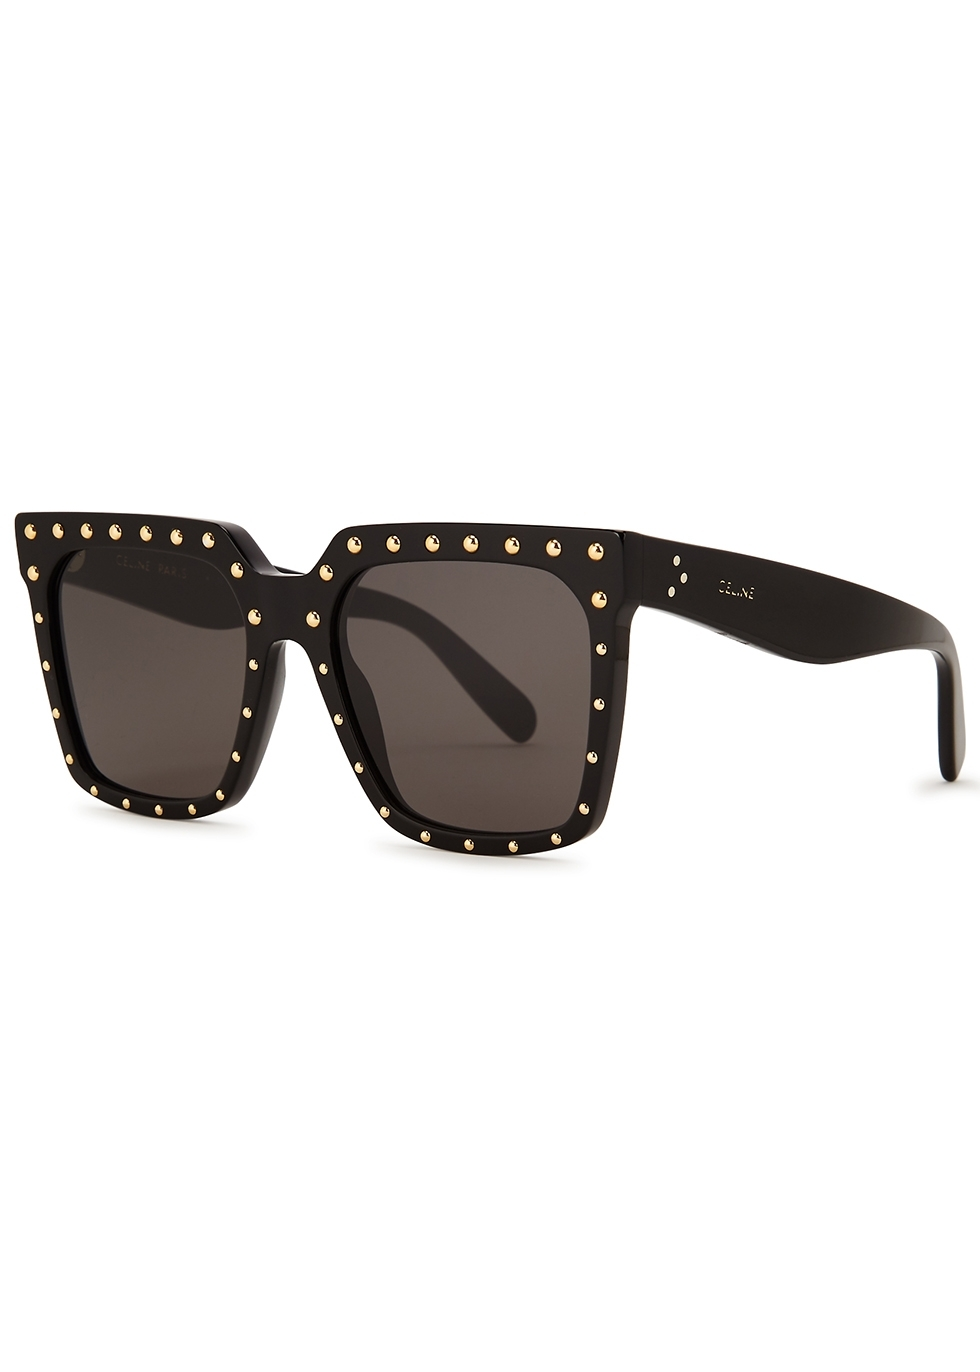 745c577ed16 Women s Designer Sunglasses and Eyewear - Harvey Nichols